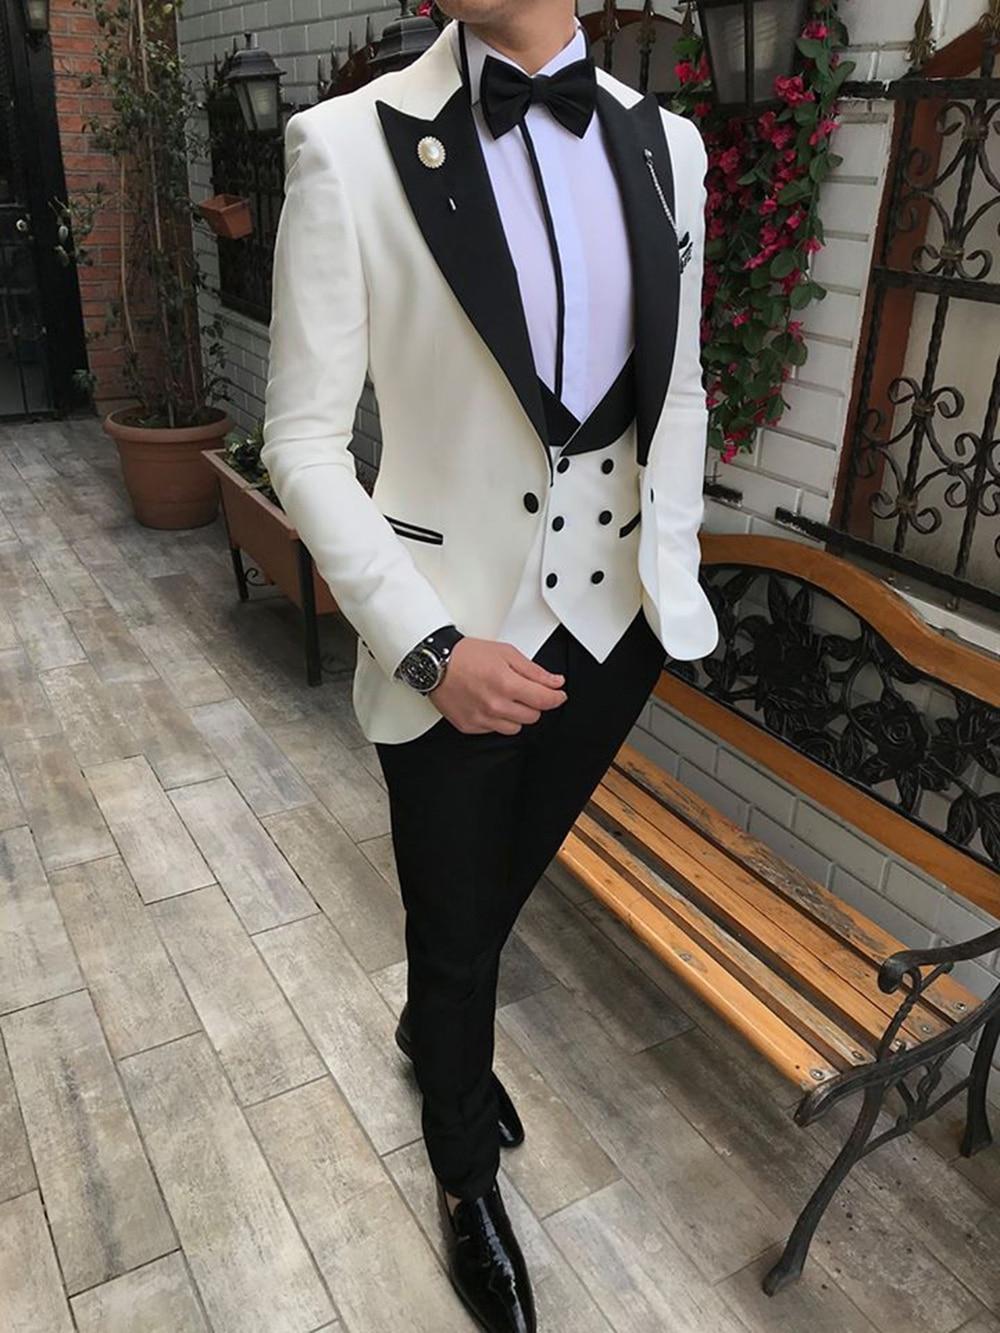 Men Suits 3 Pieces Slim Fit Business Suits Groom Champagne Noble Grey White Tuxedos For Formal Wedding Suit(Blazer+Pants+Vest)